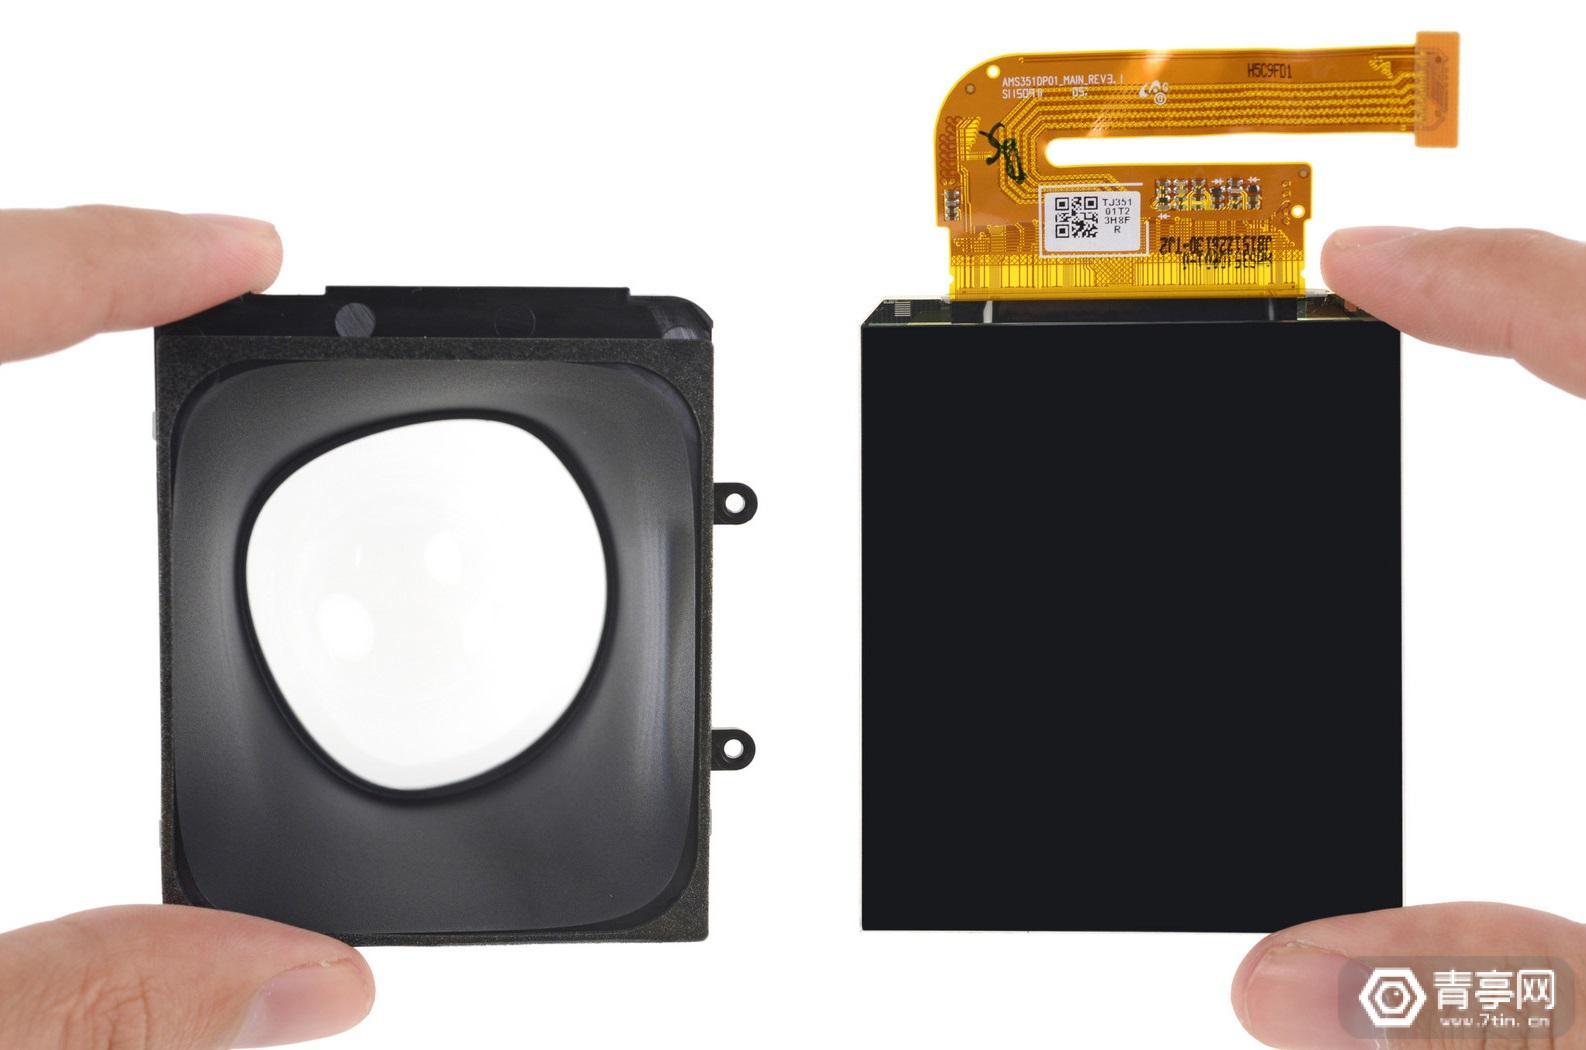 JDI推出全新高端VR液晶面板,或将用于索尼第二代PSVR